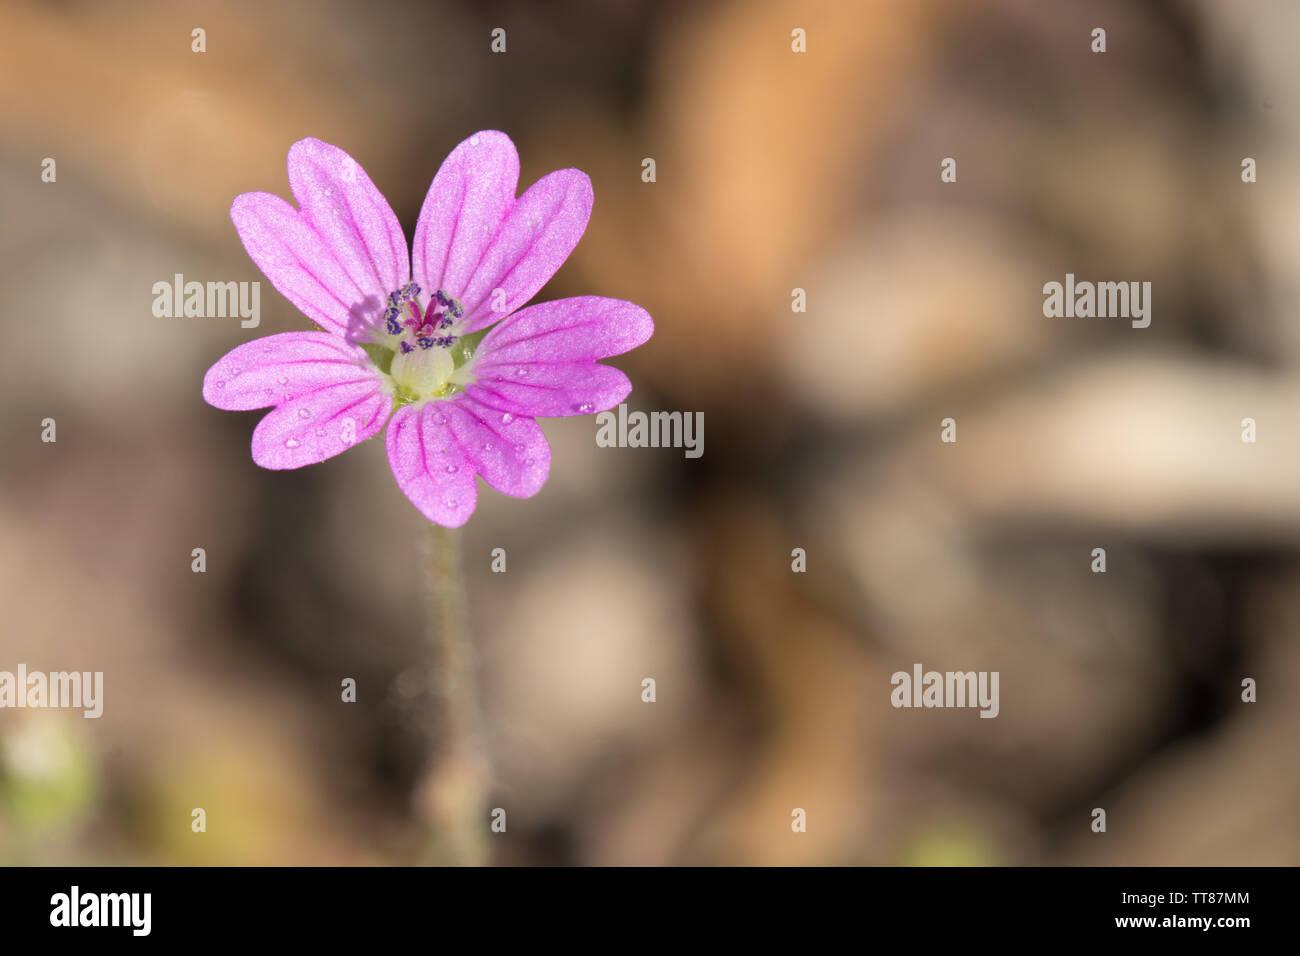 Geranium molle. Macro shot of a single flower n the sunlight. Frankfurt, Germany. - Stock Image